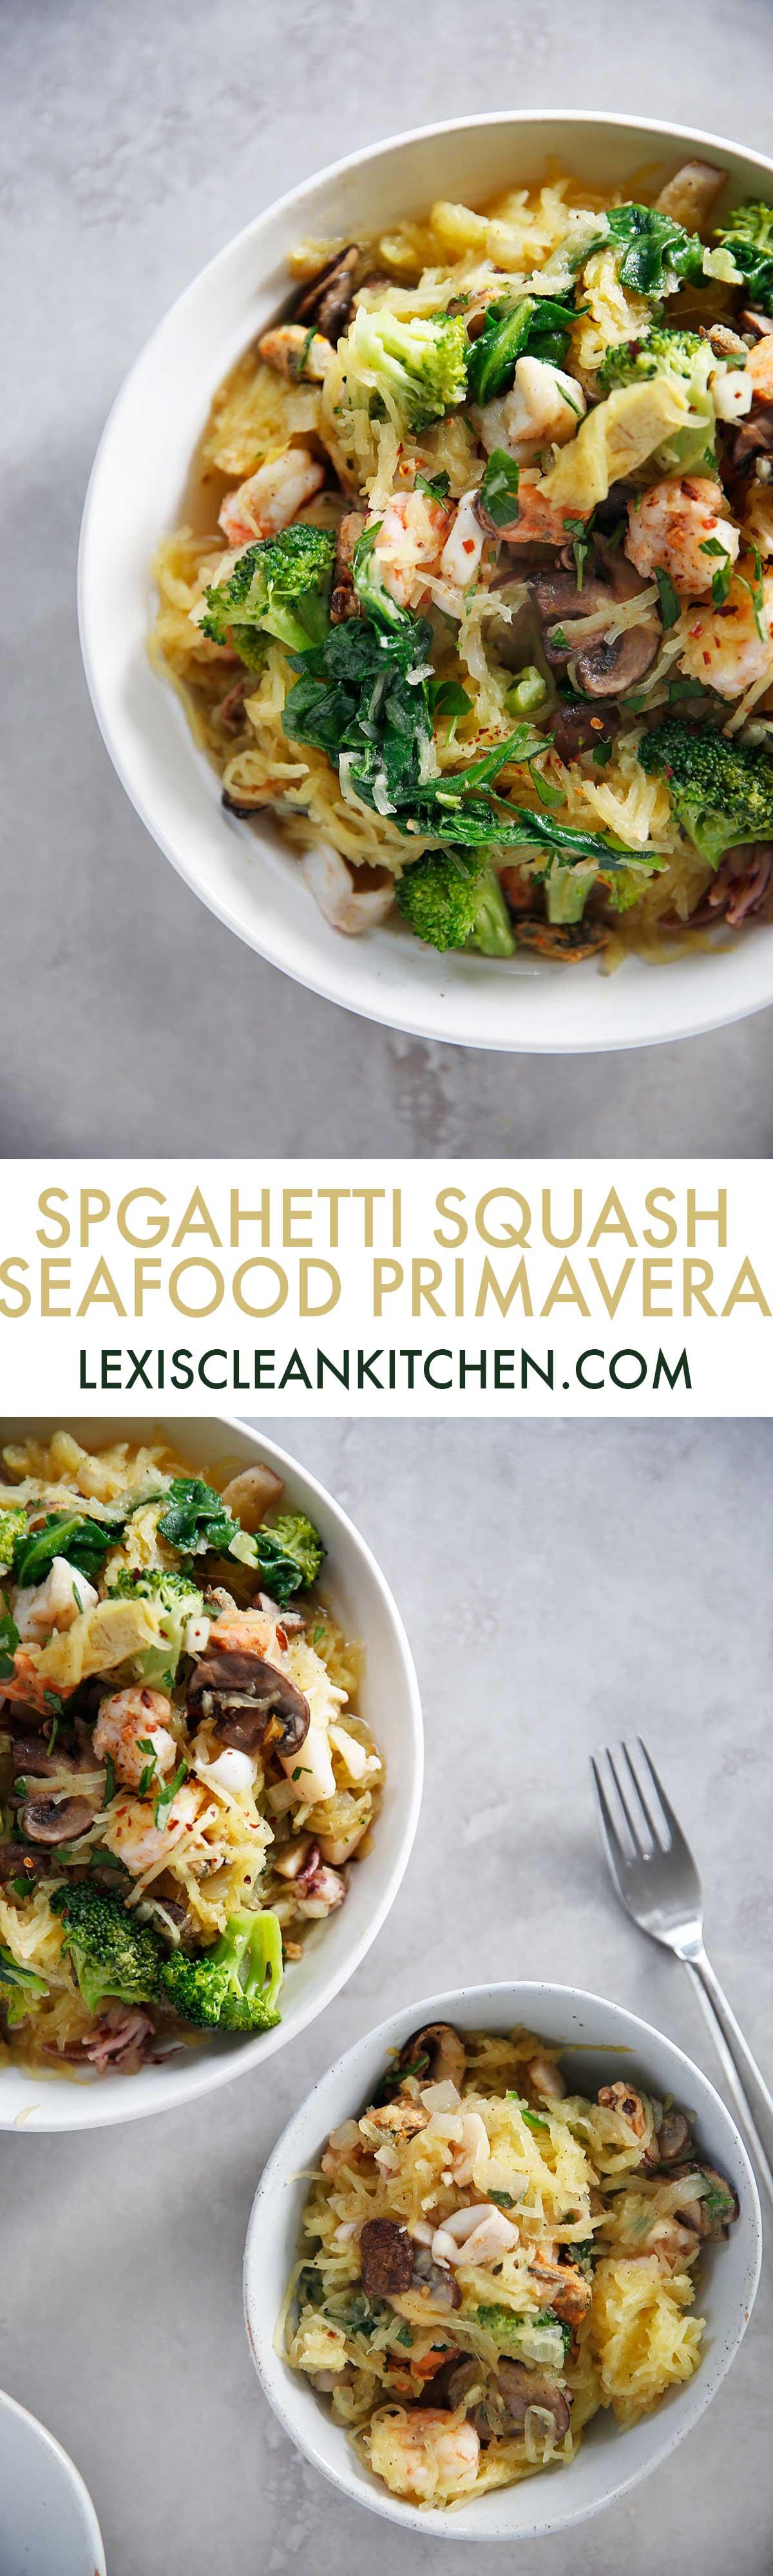 Seafood Primavera [paleo-friendly, dairy-free, gluten-free]   Lexi's Clean Kitchen